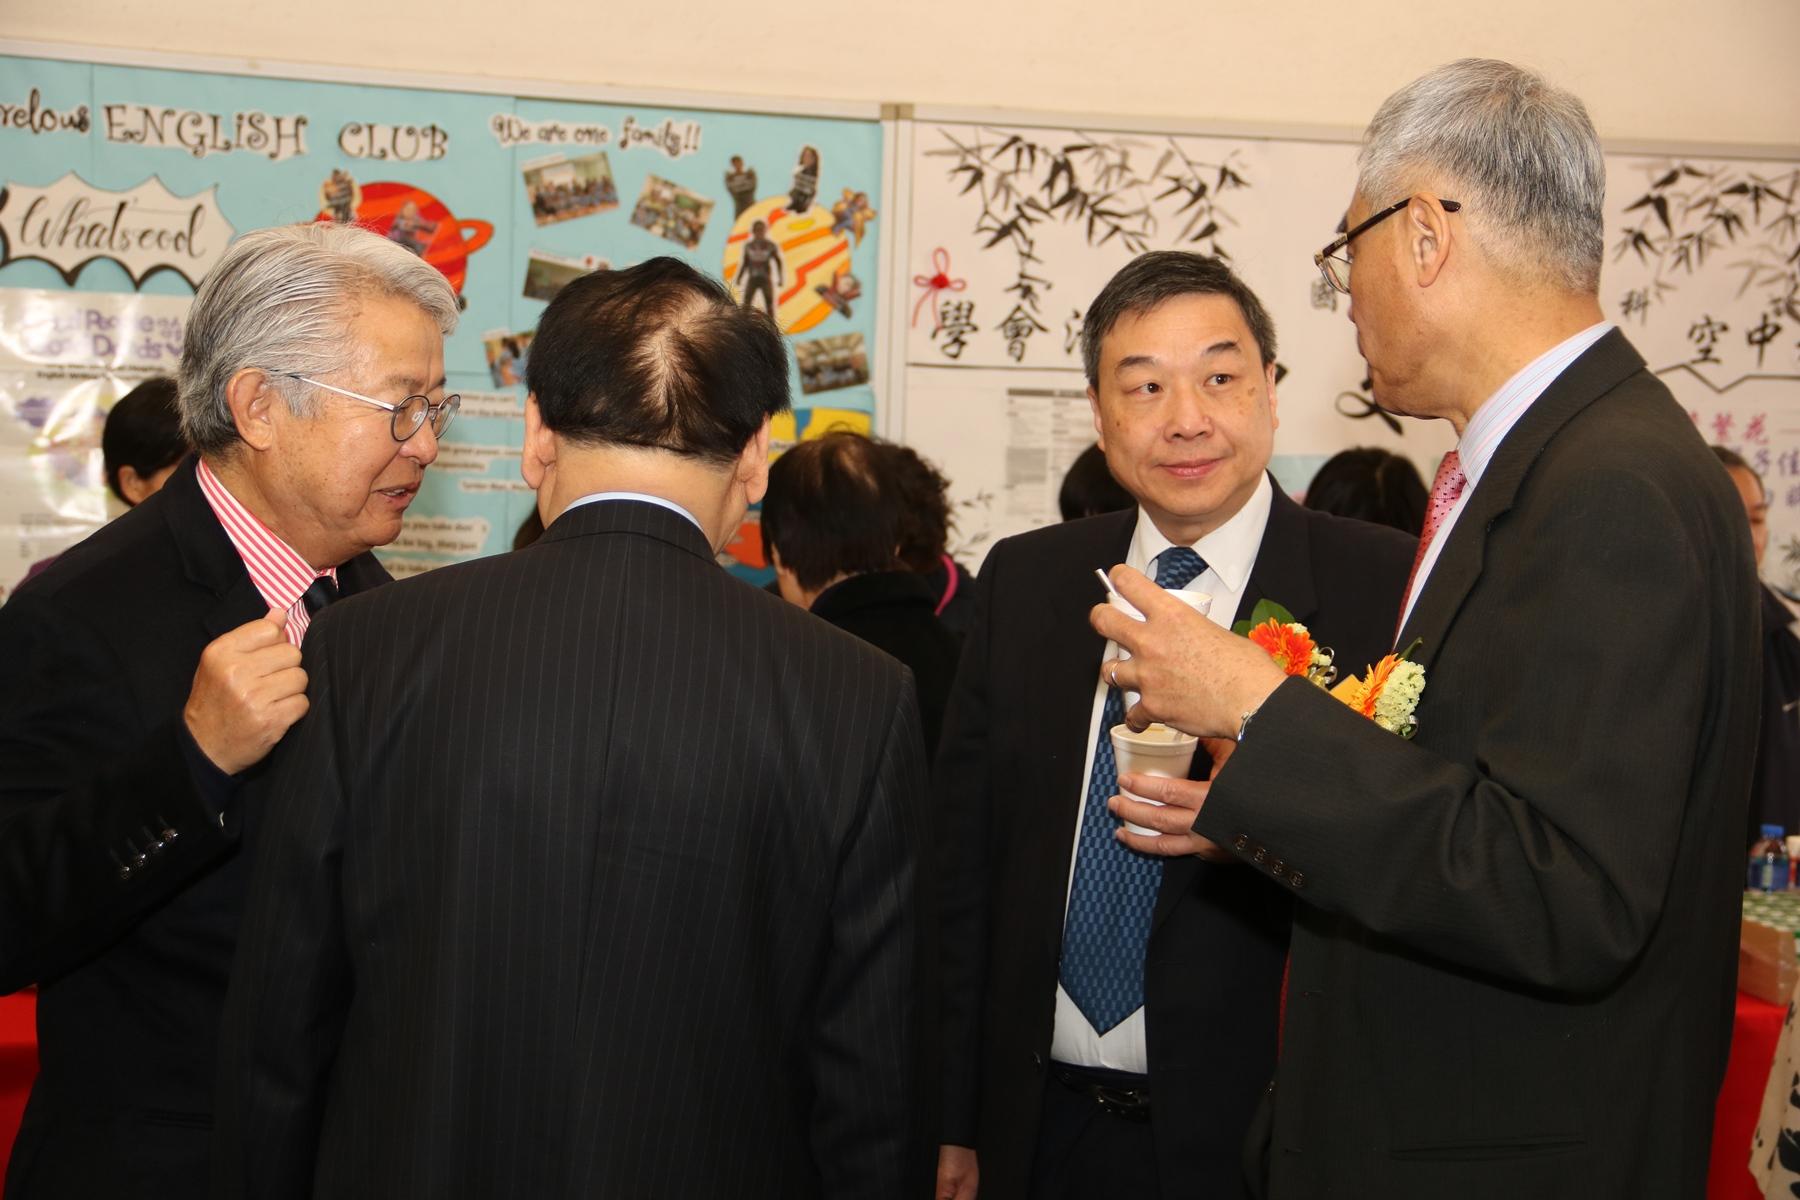 http://npc.edu.hk/sites/default/files/18_img_2670.jpg